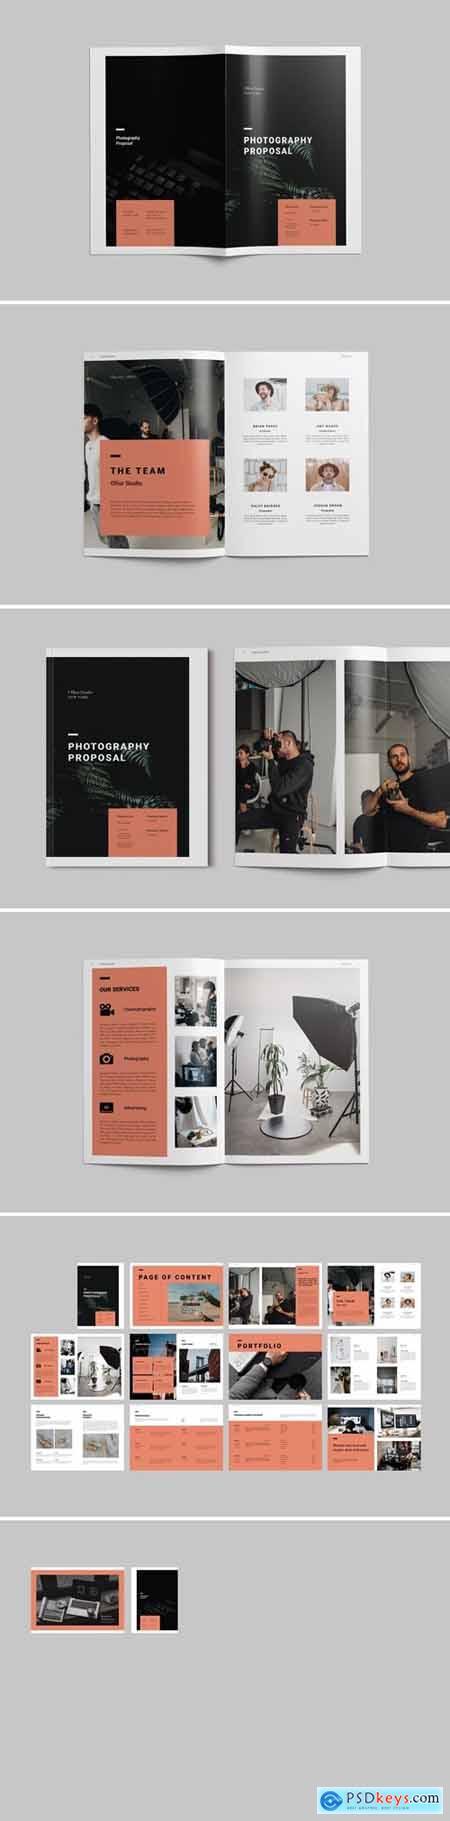 Photography Proposal Template 9MDKAEM